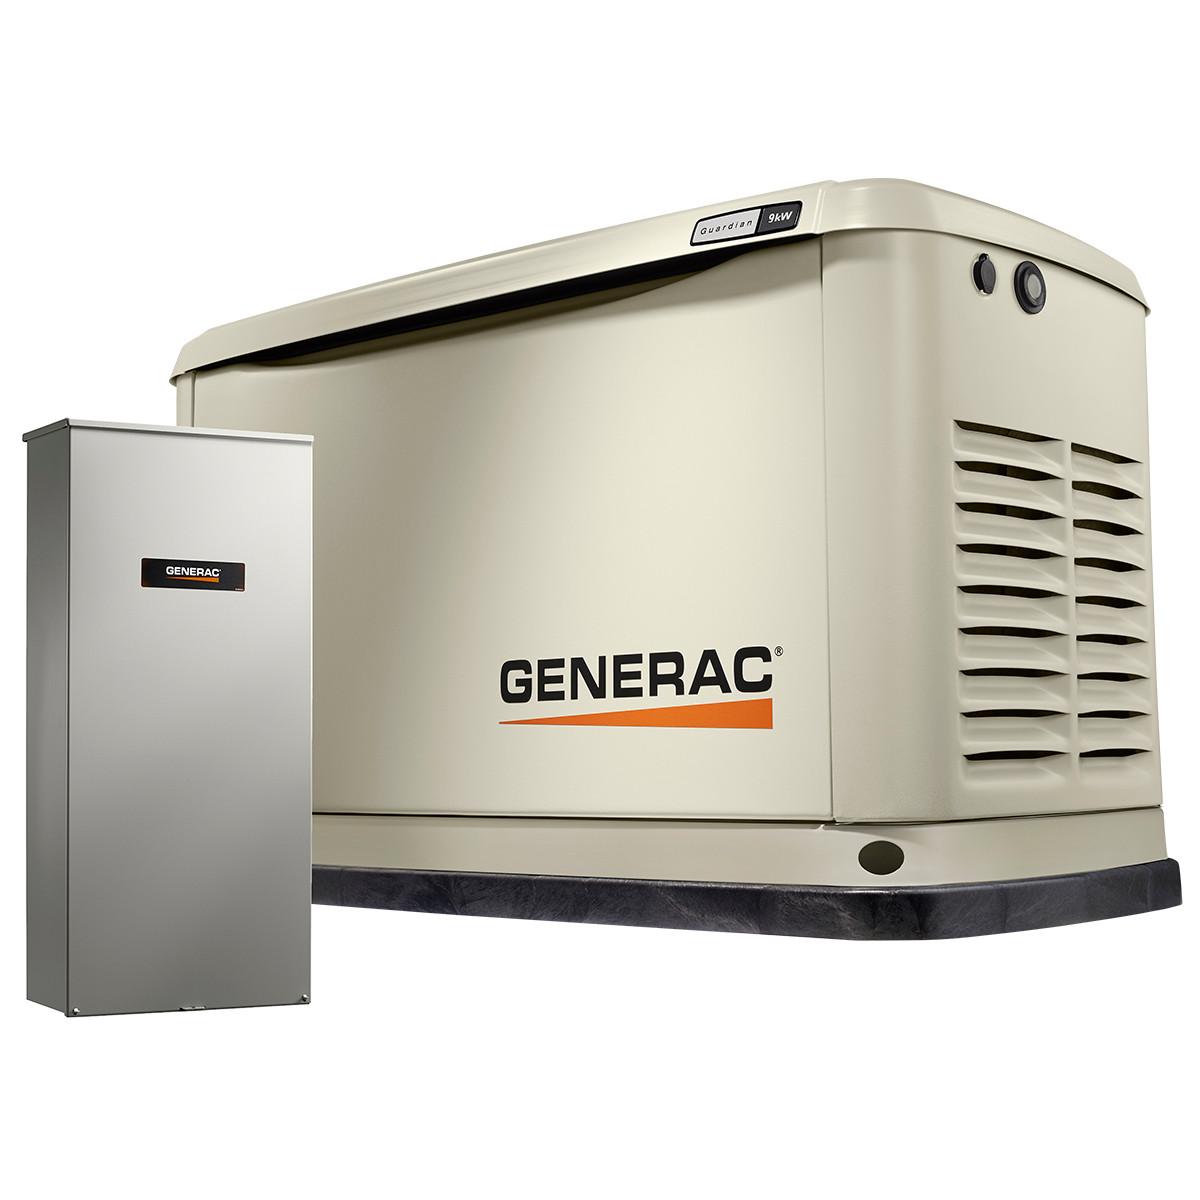 Generac 7030 9kw Generator 100a 16 Circuit Transfer Switch Manual Wiring Diagram Guardian With Wi Fi